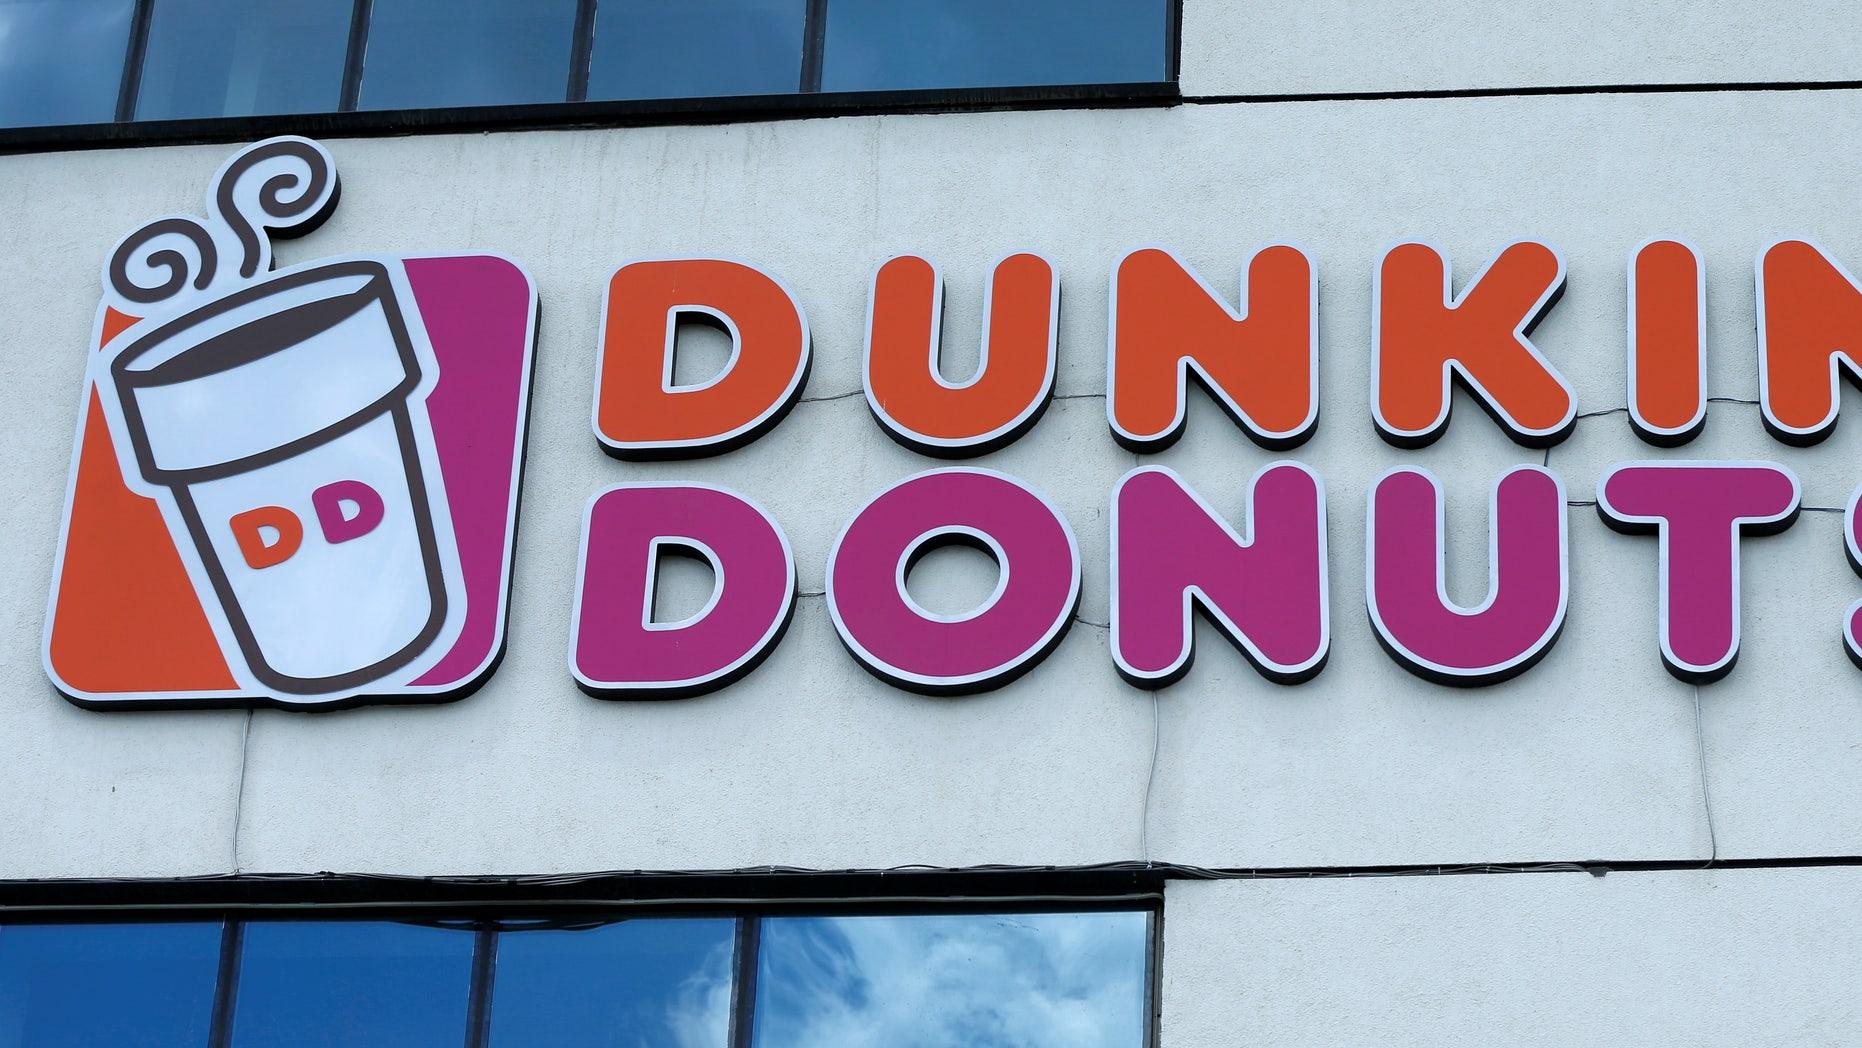 The logo of Dunkin' Donuts is on display in Tbilisi, Georgia, July 13, 2016. REUTERS/David Mdzinarishvili - RTSHVQ9